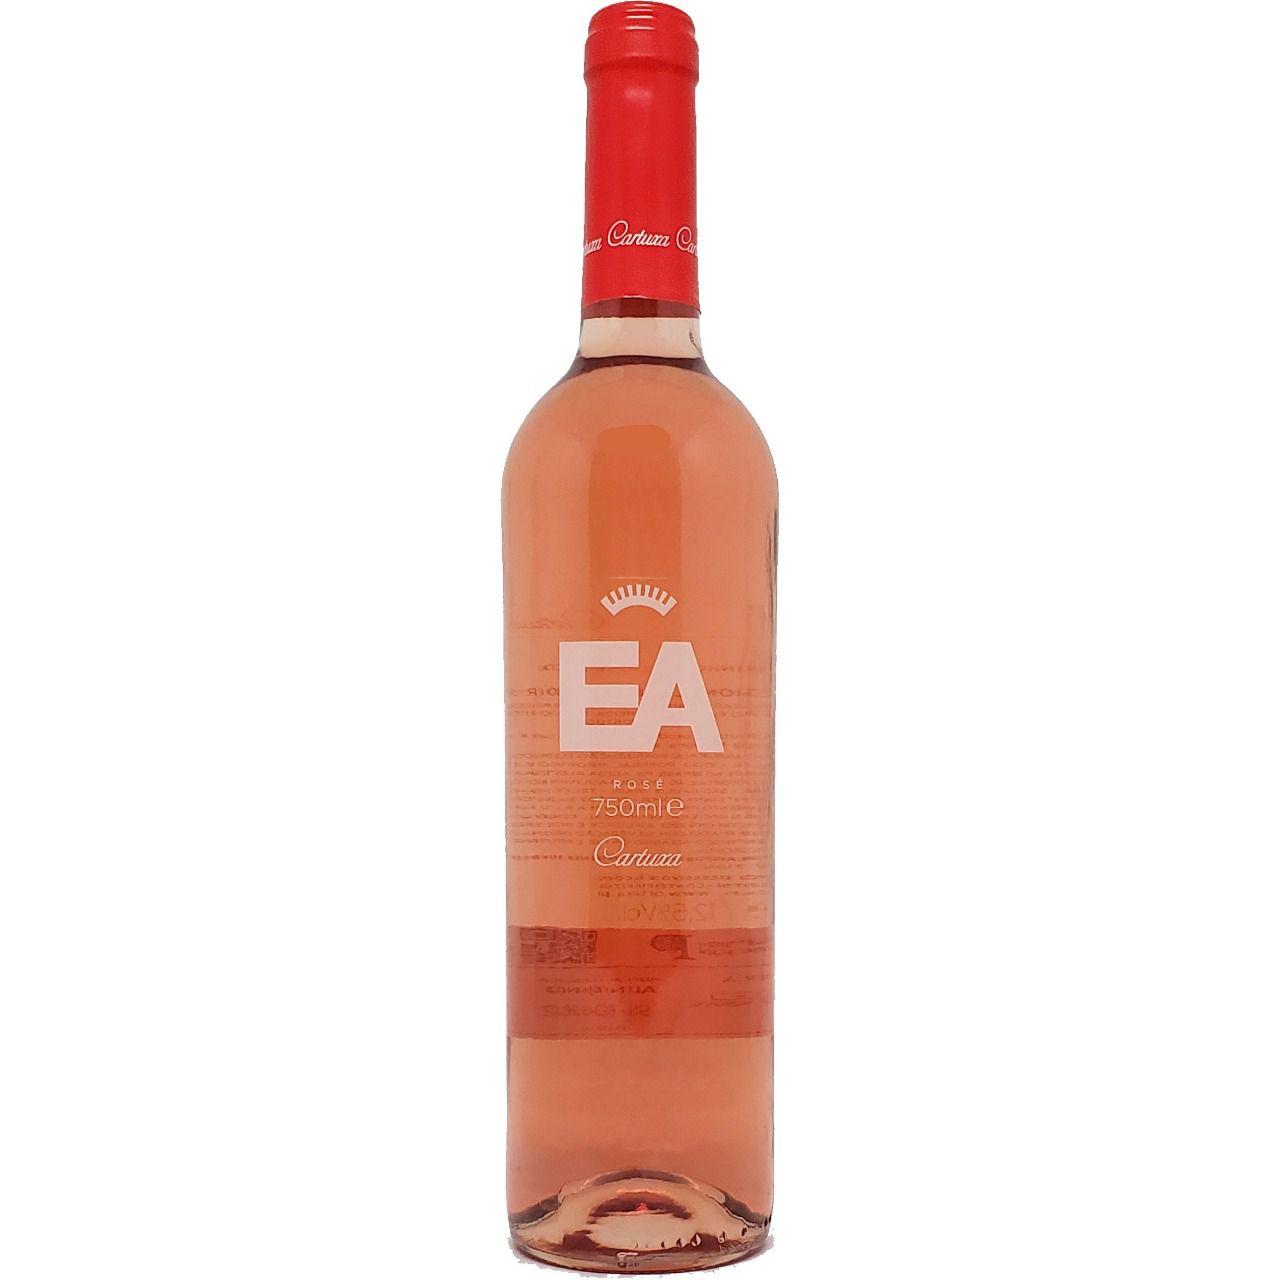 Vinho Rosé EA Cartuxa - 750ml -